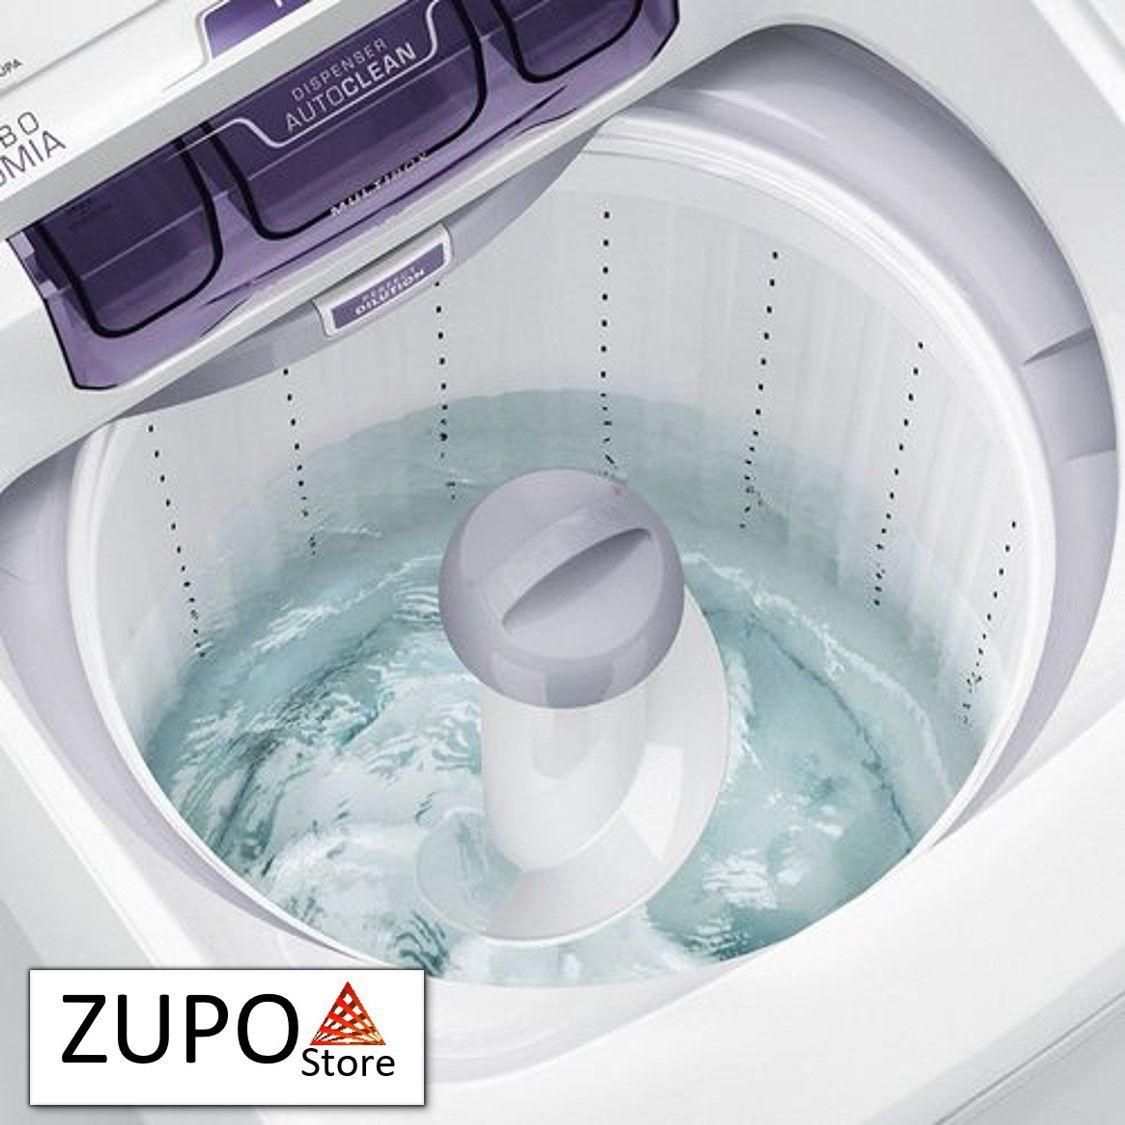 Lavadora de Roupas 10,5 Kilos Branca Electrolux - LAC11 - 127V